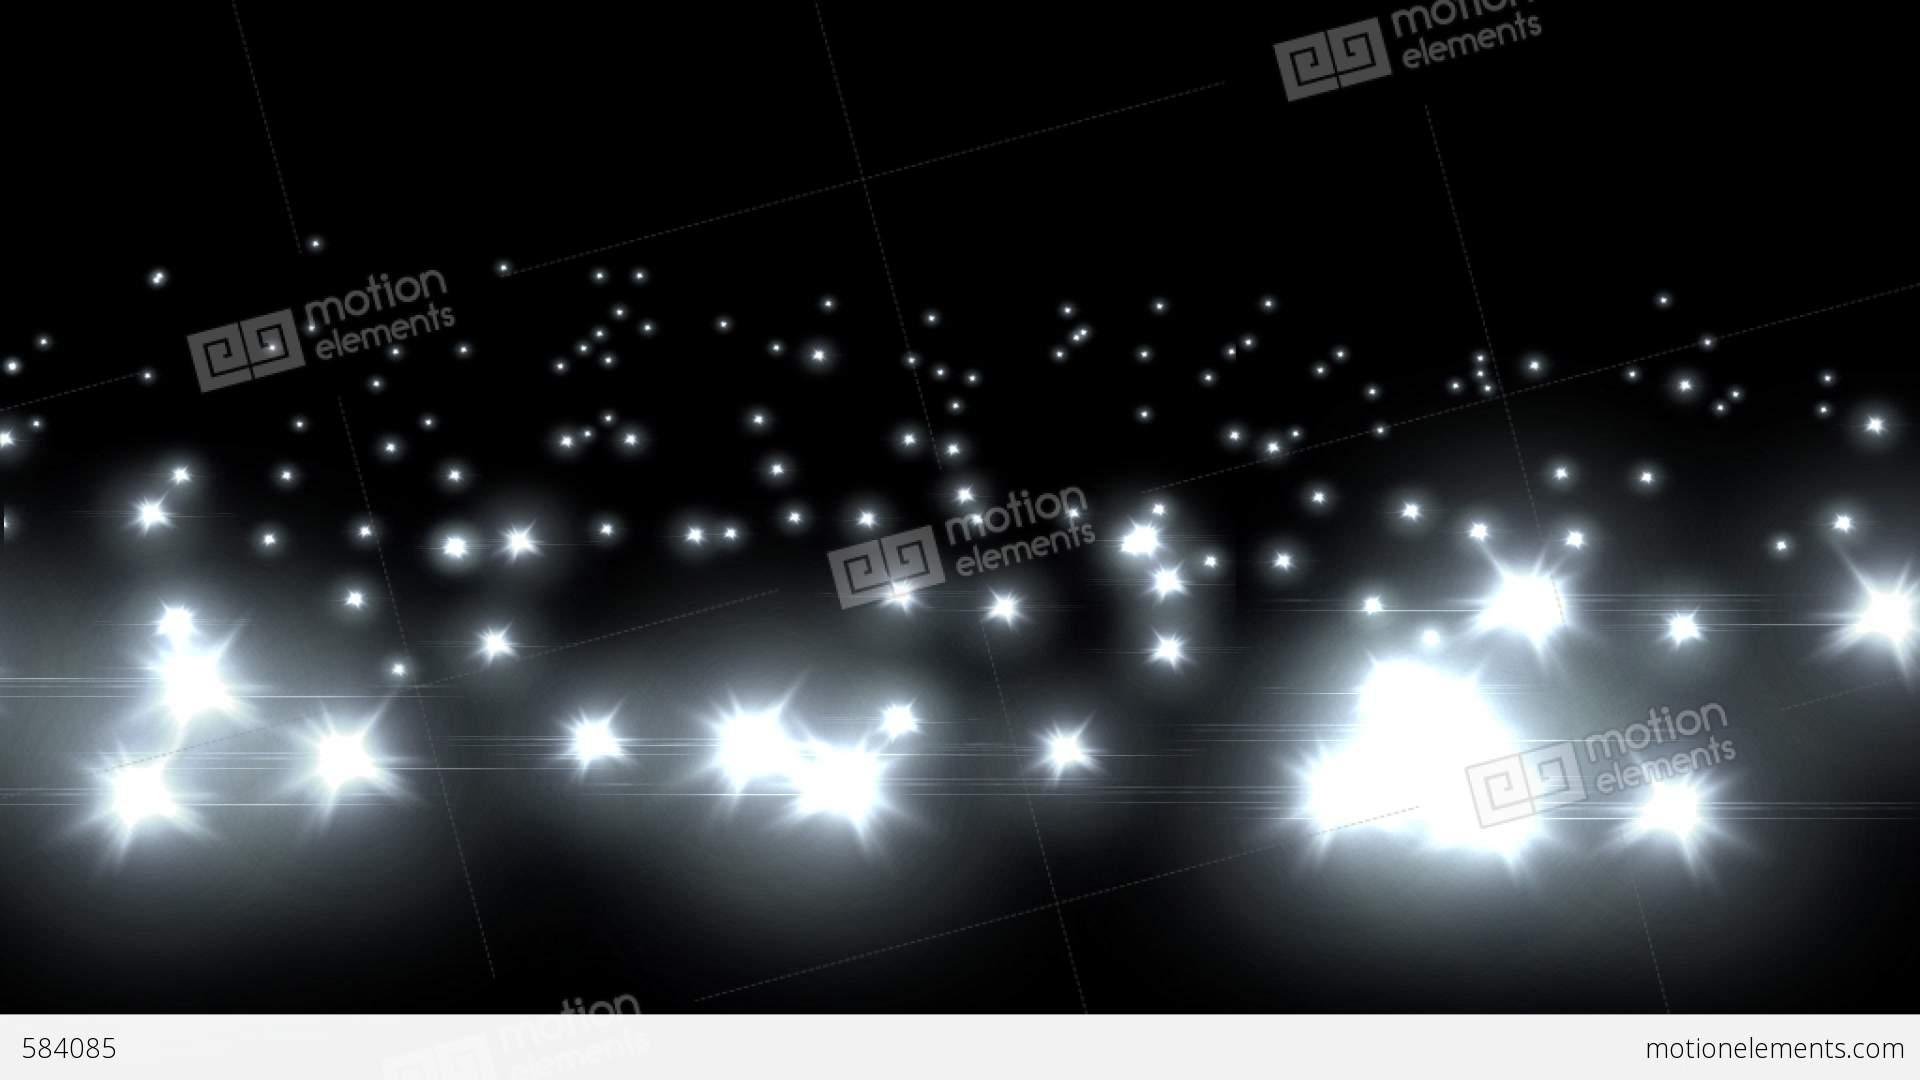 pl shop utilitech lowes lumen flashlight bulbs at com flashlights tools handheld lighting flash led lights